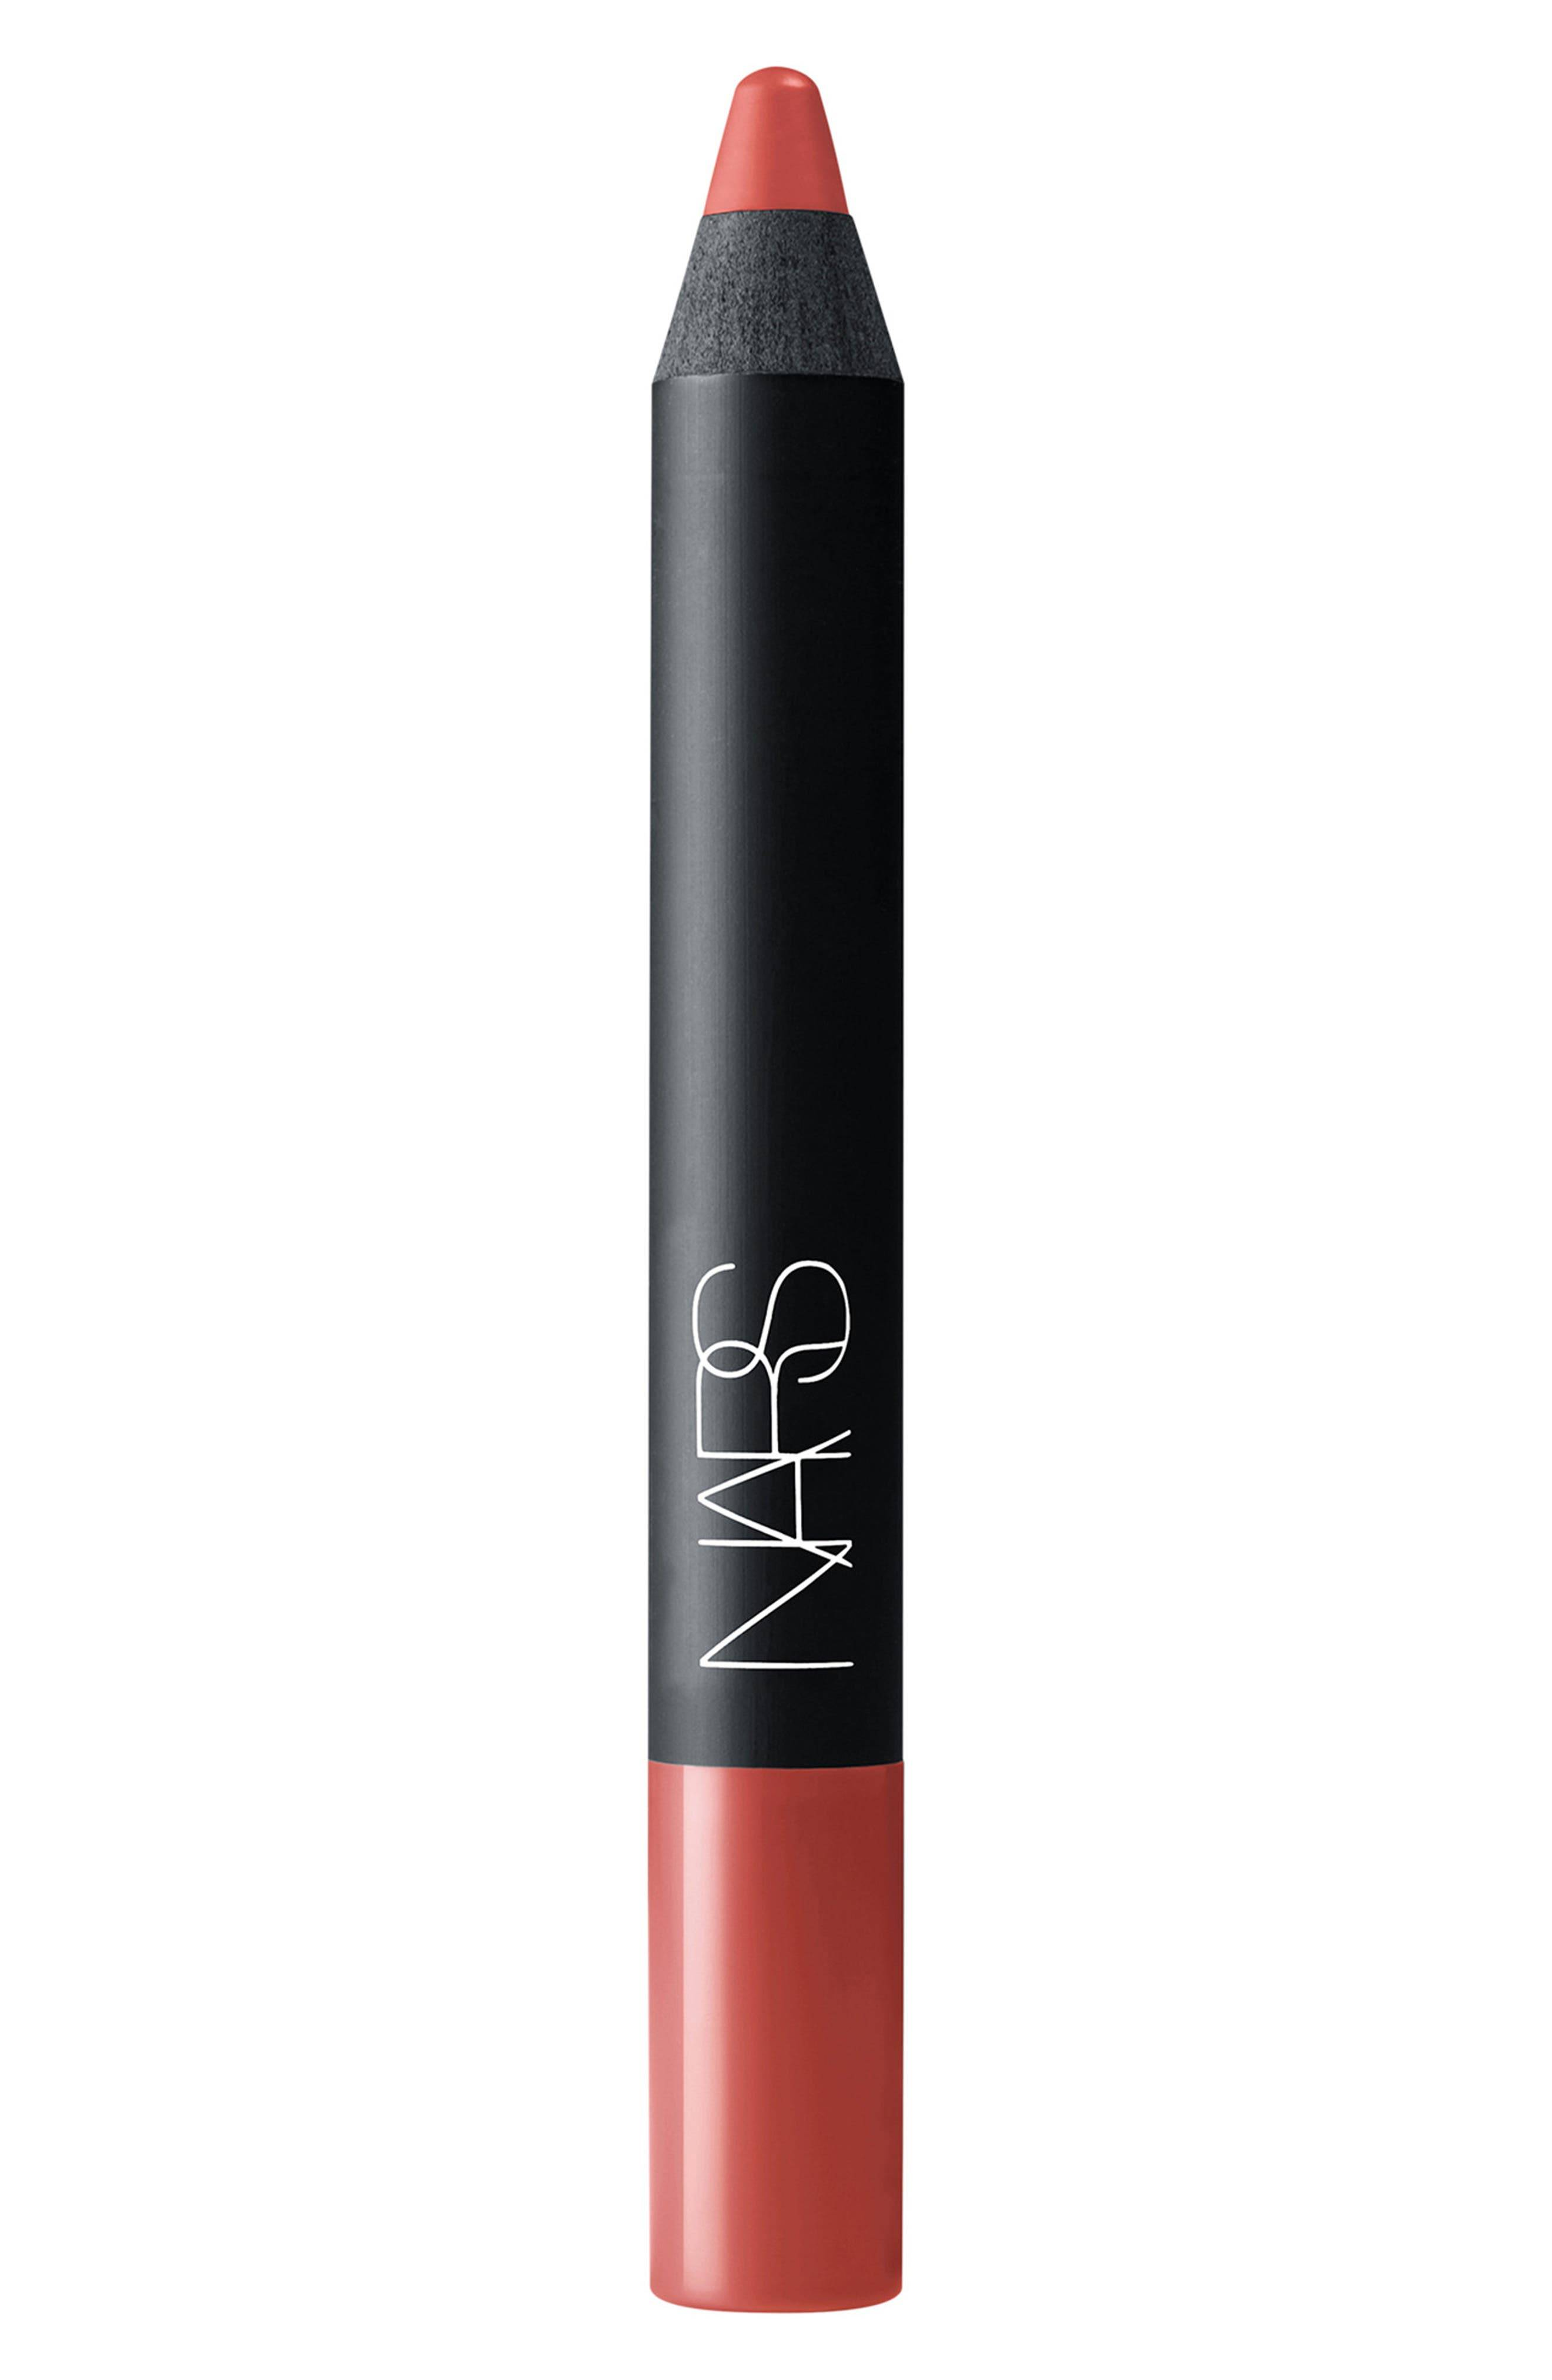 Nars Velvet Matte Lipstick Pencil - Take Me Home